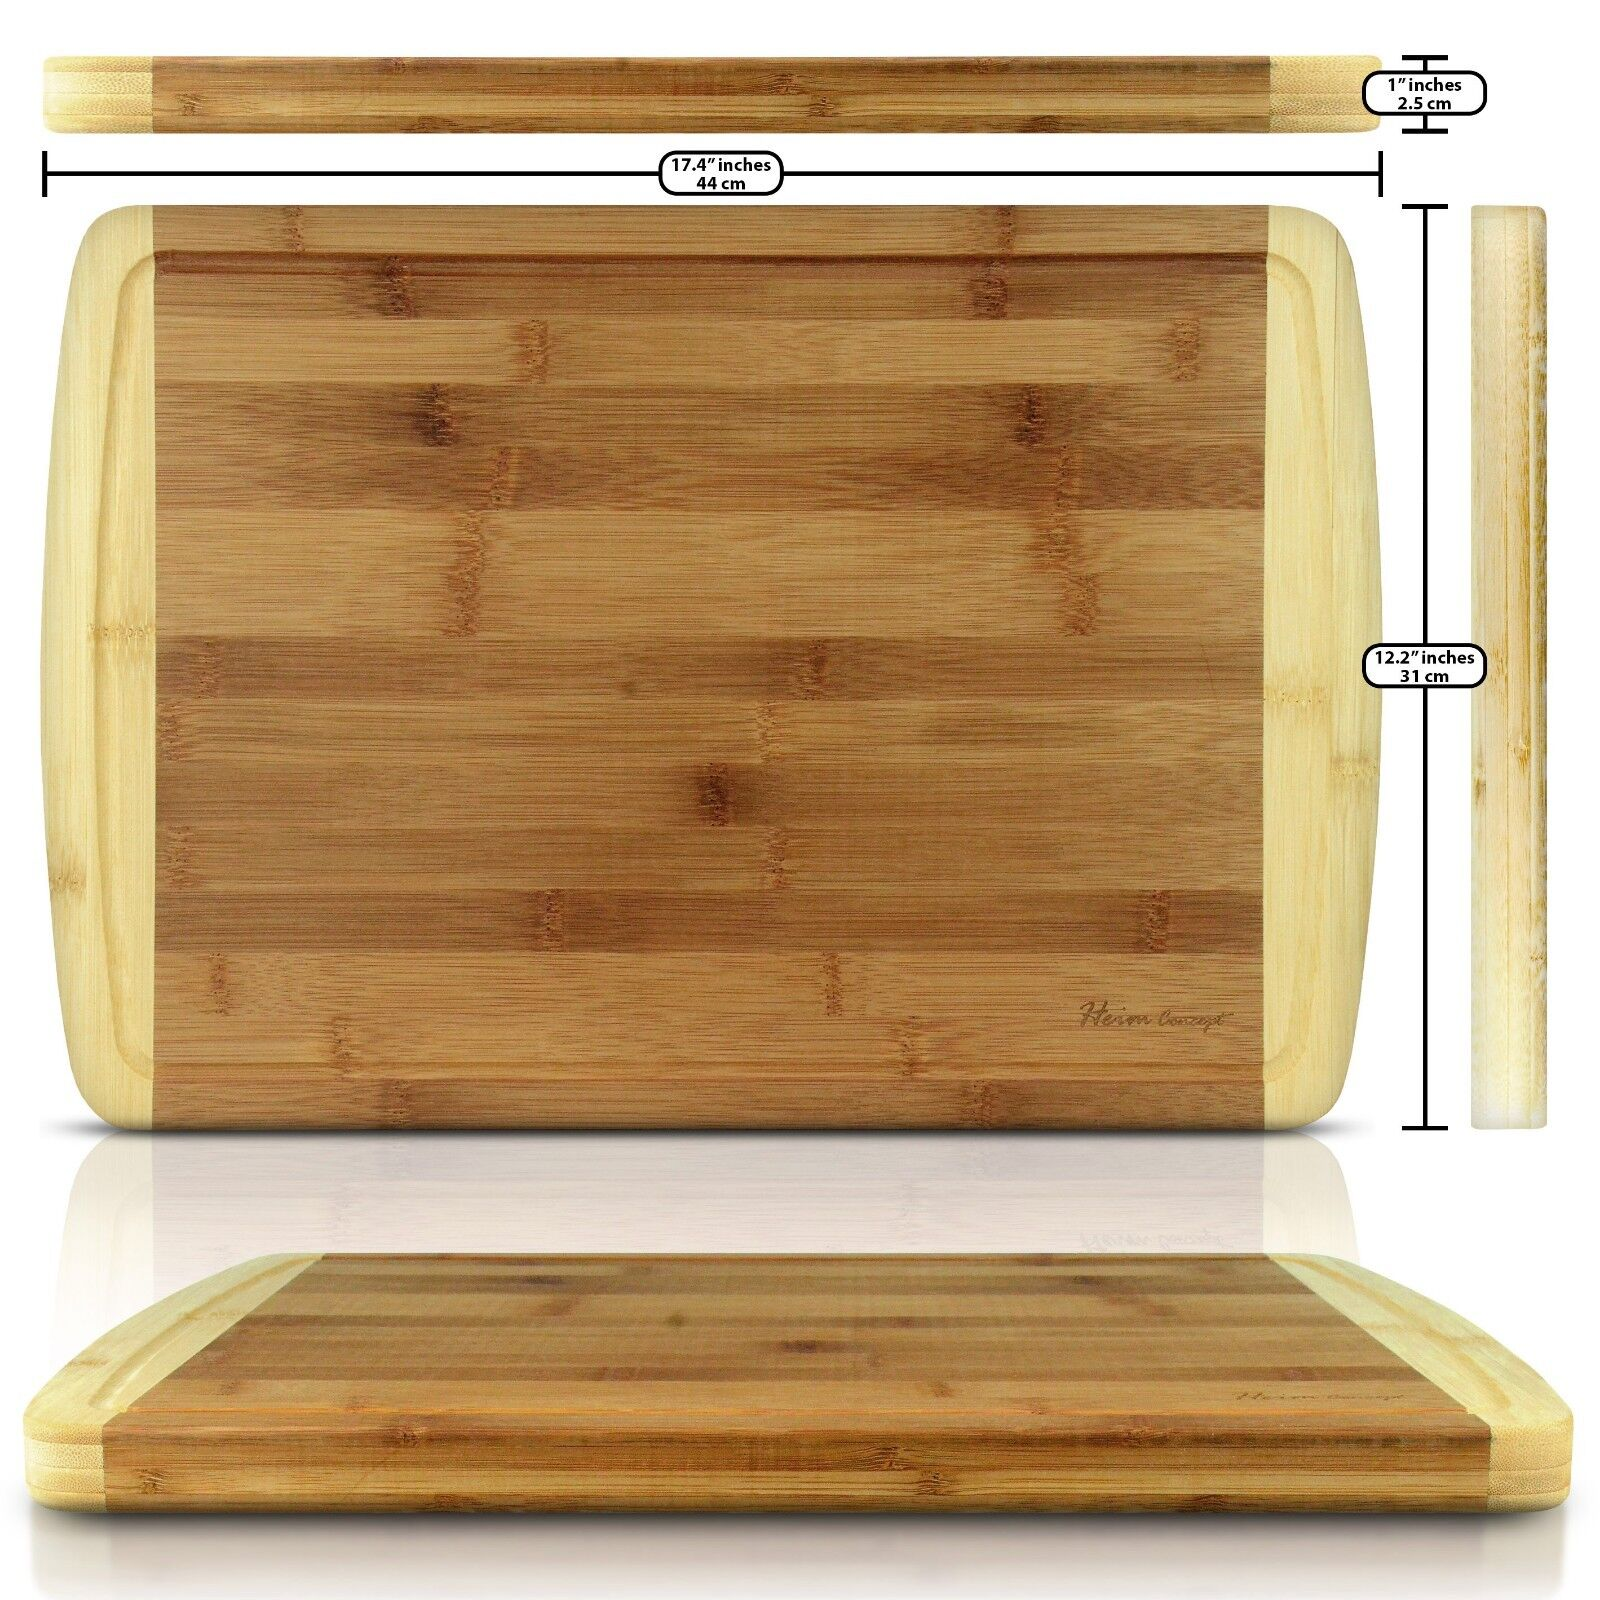 heim 39 s organic bamboo wood large cutting board kitchen chopping block end groove ebay. Black Bedroom Furniture Sets. Home Design Ideas